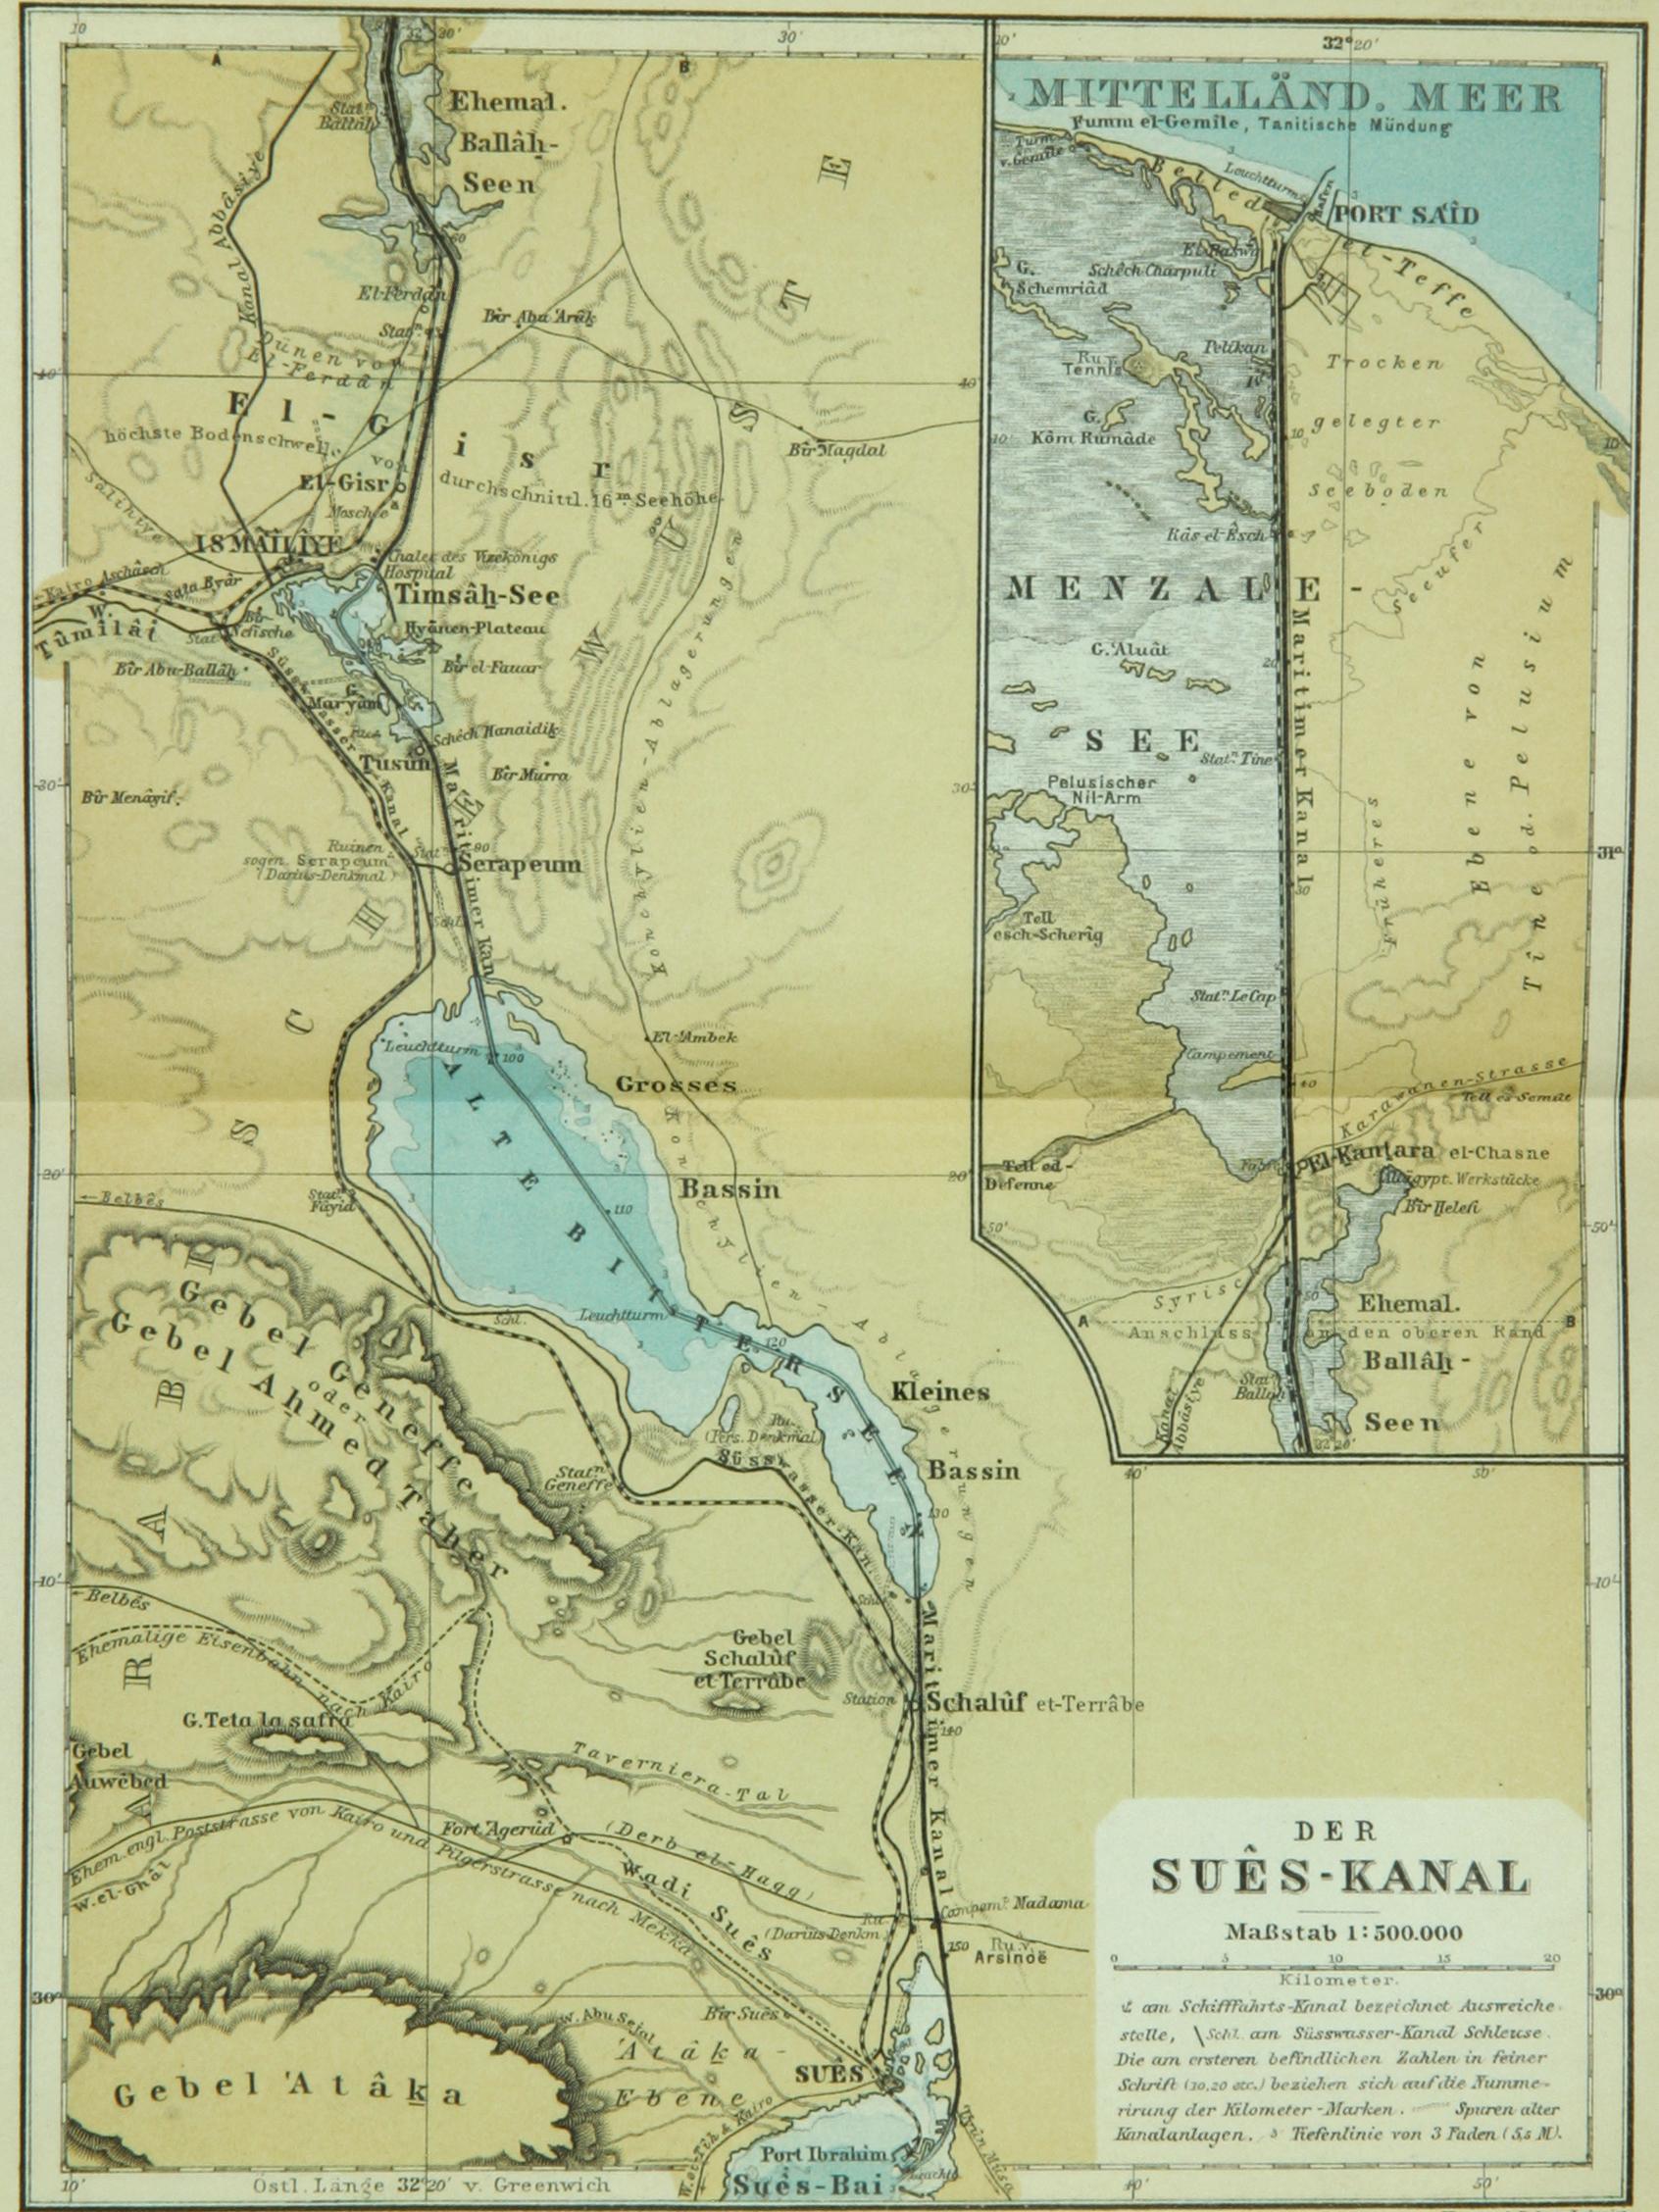 Suez_Canal_%28ca_1914%29.jpg